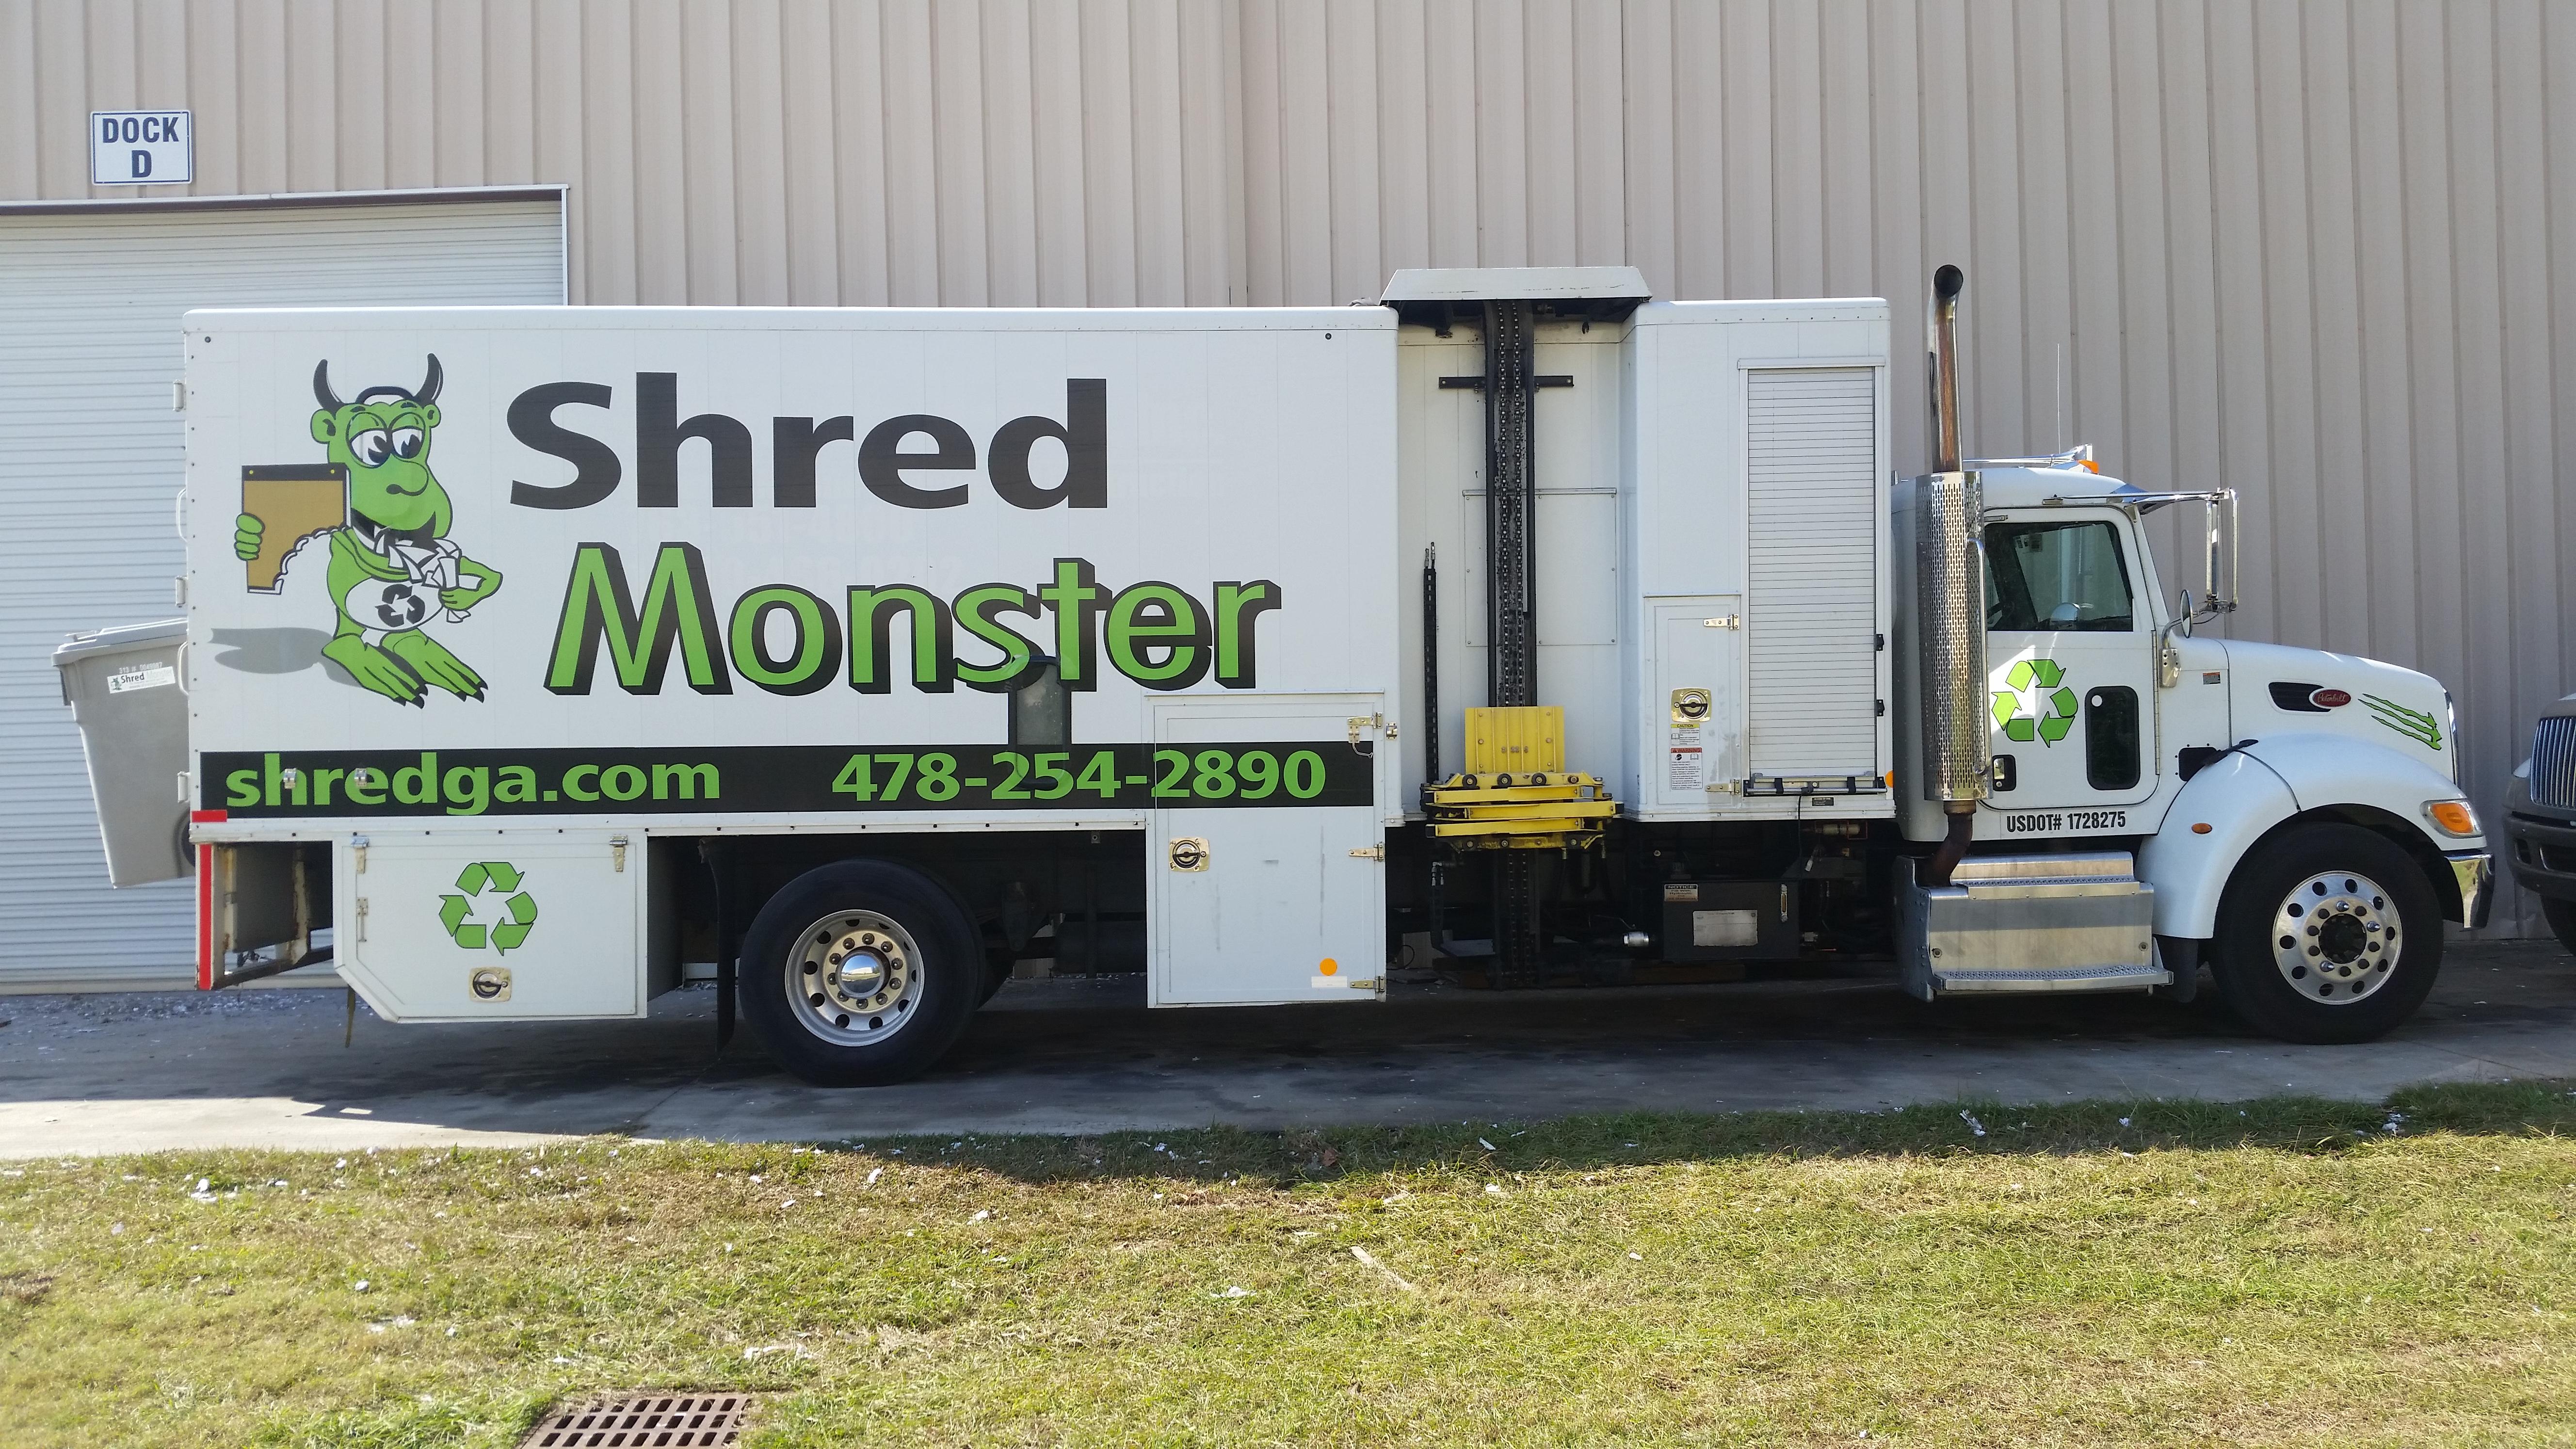 Shred Truck 2